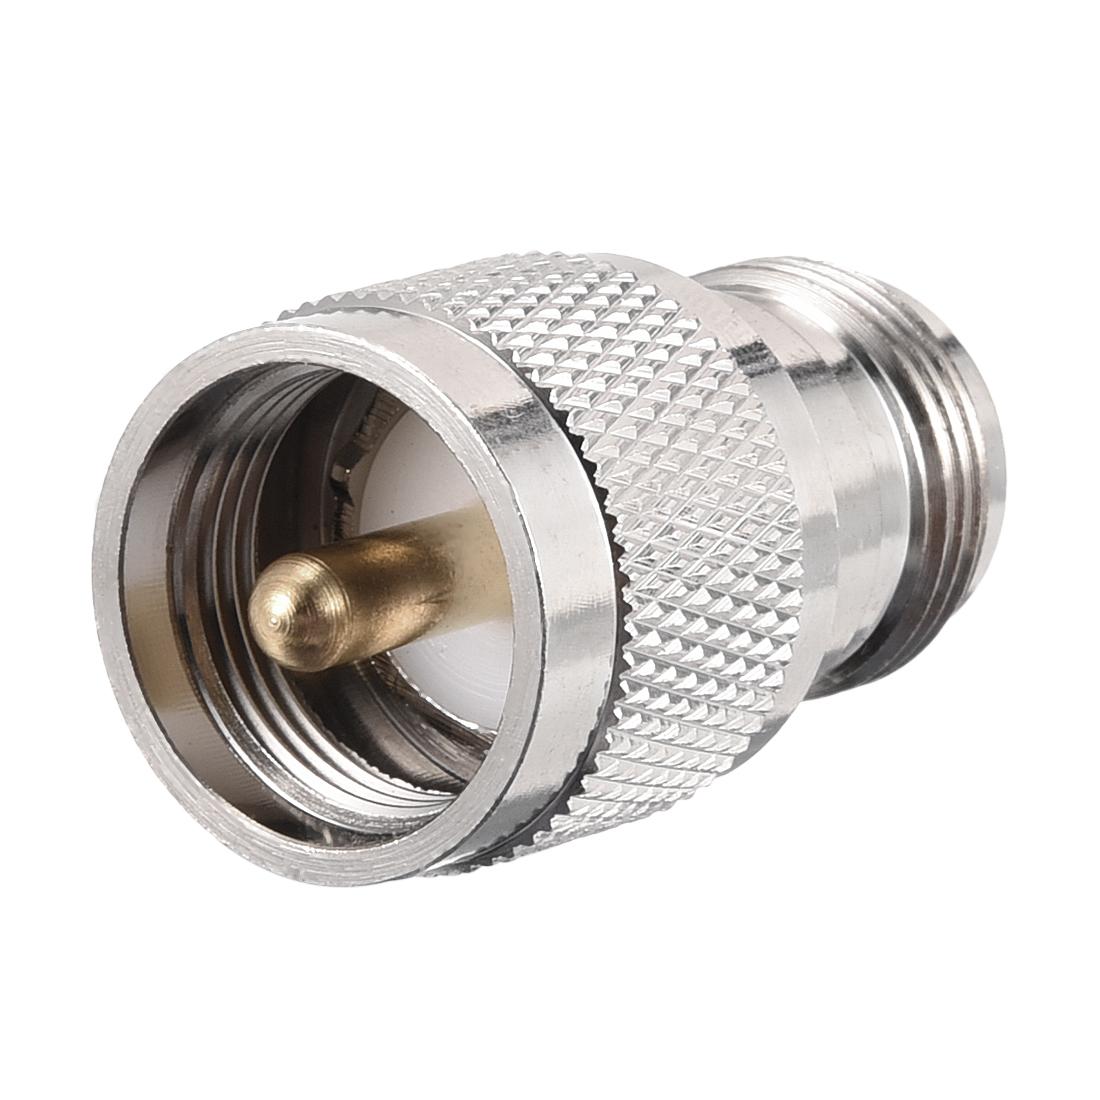 UHF Male to N Female 5/8-24 RF Coaxial Coax Adapter 1pcs